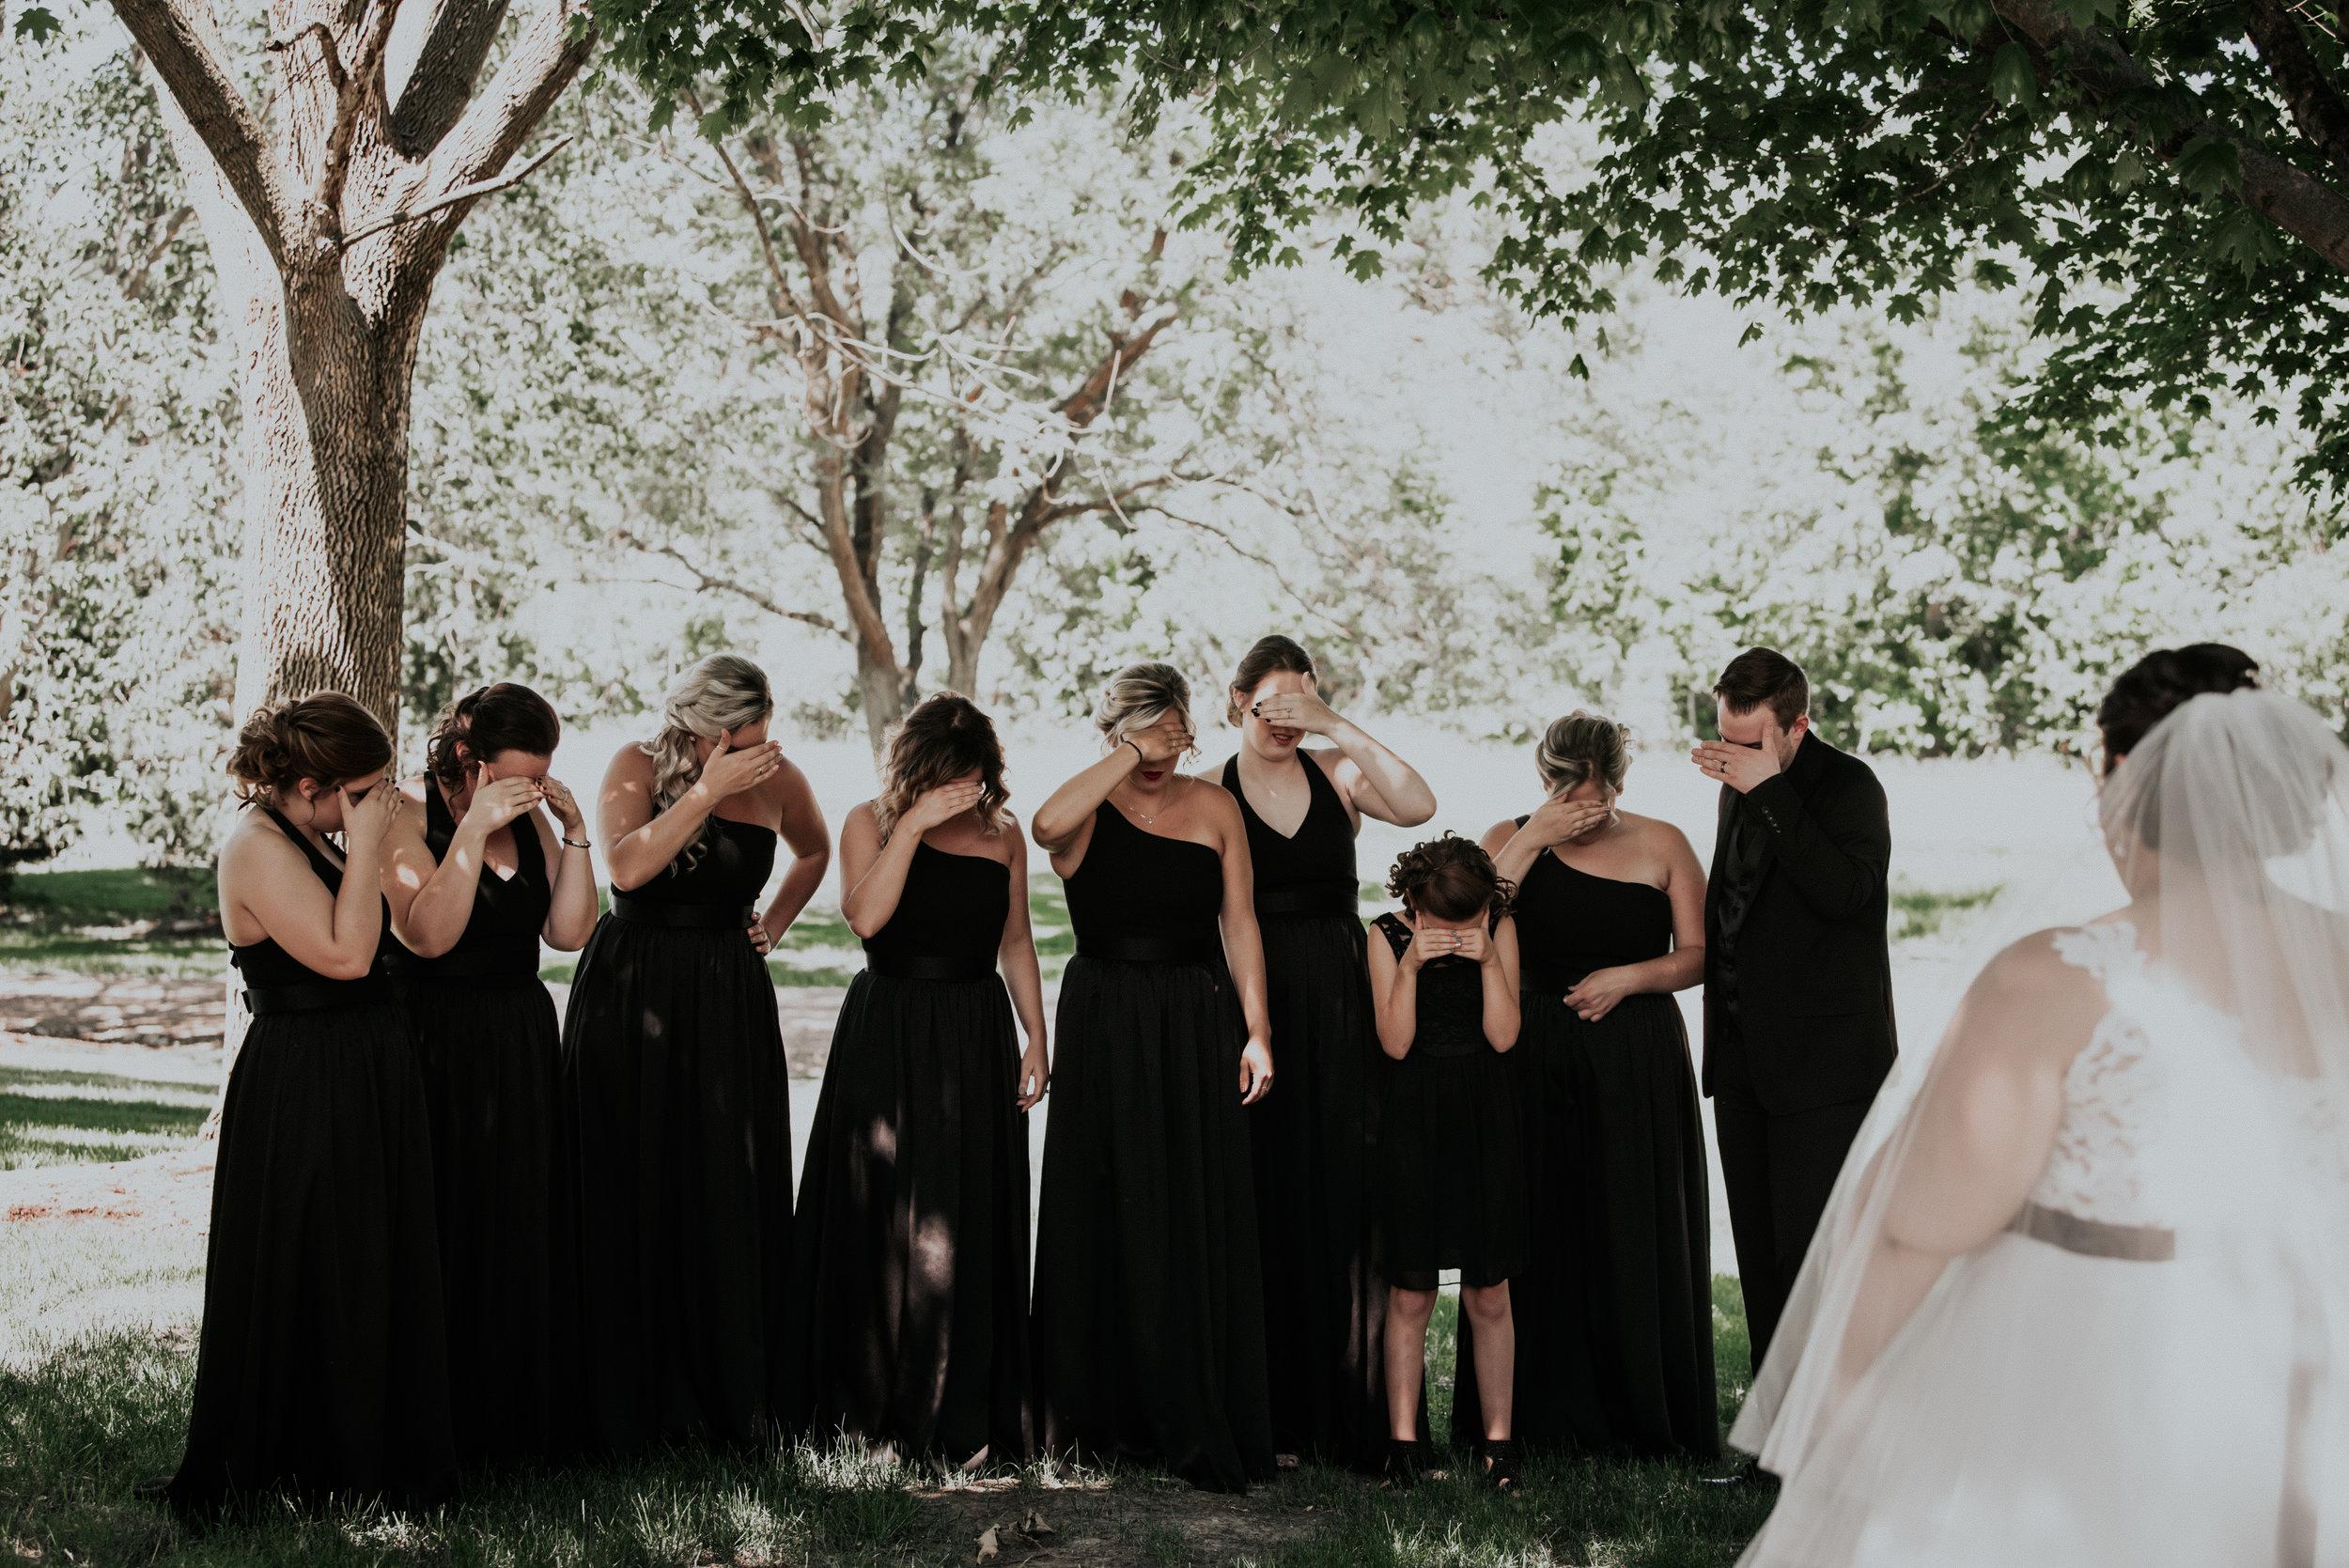 BridesbyYoung-RealWedding-PlusSizeBridal-BillyCourtney-JurassicParkTheme-10.jpg